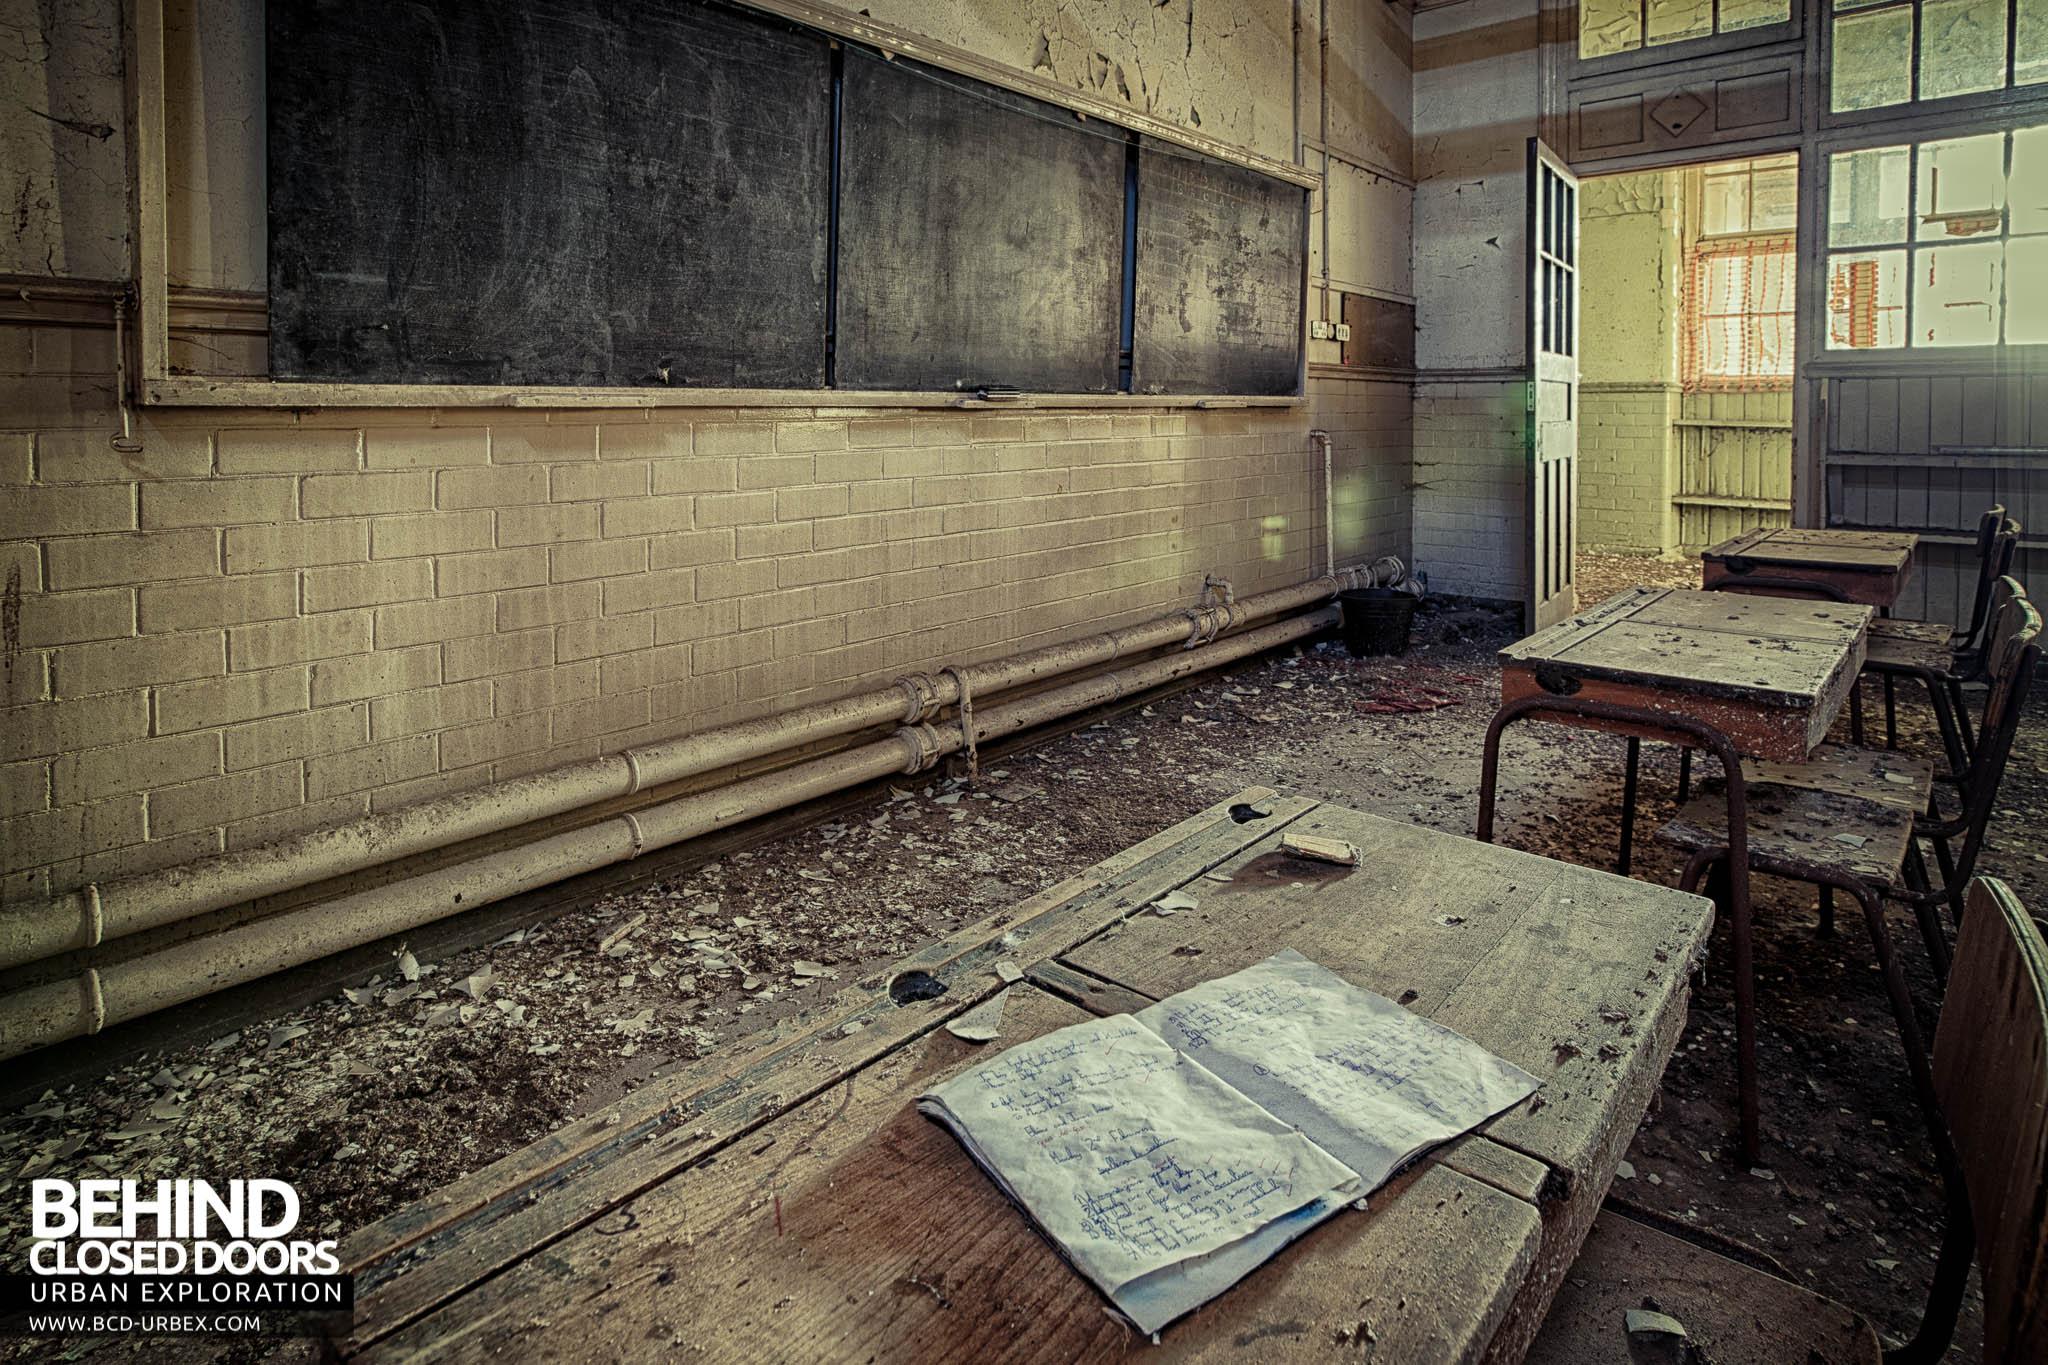 Behind Closed Doors : Easington colliery primary school durham urbex behind